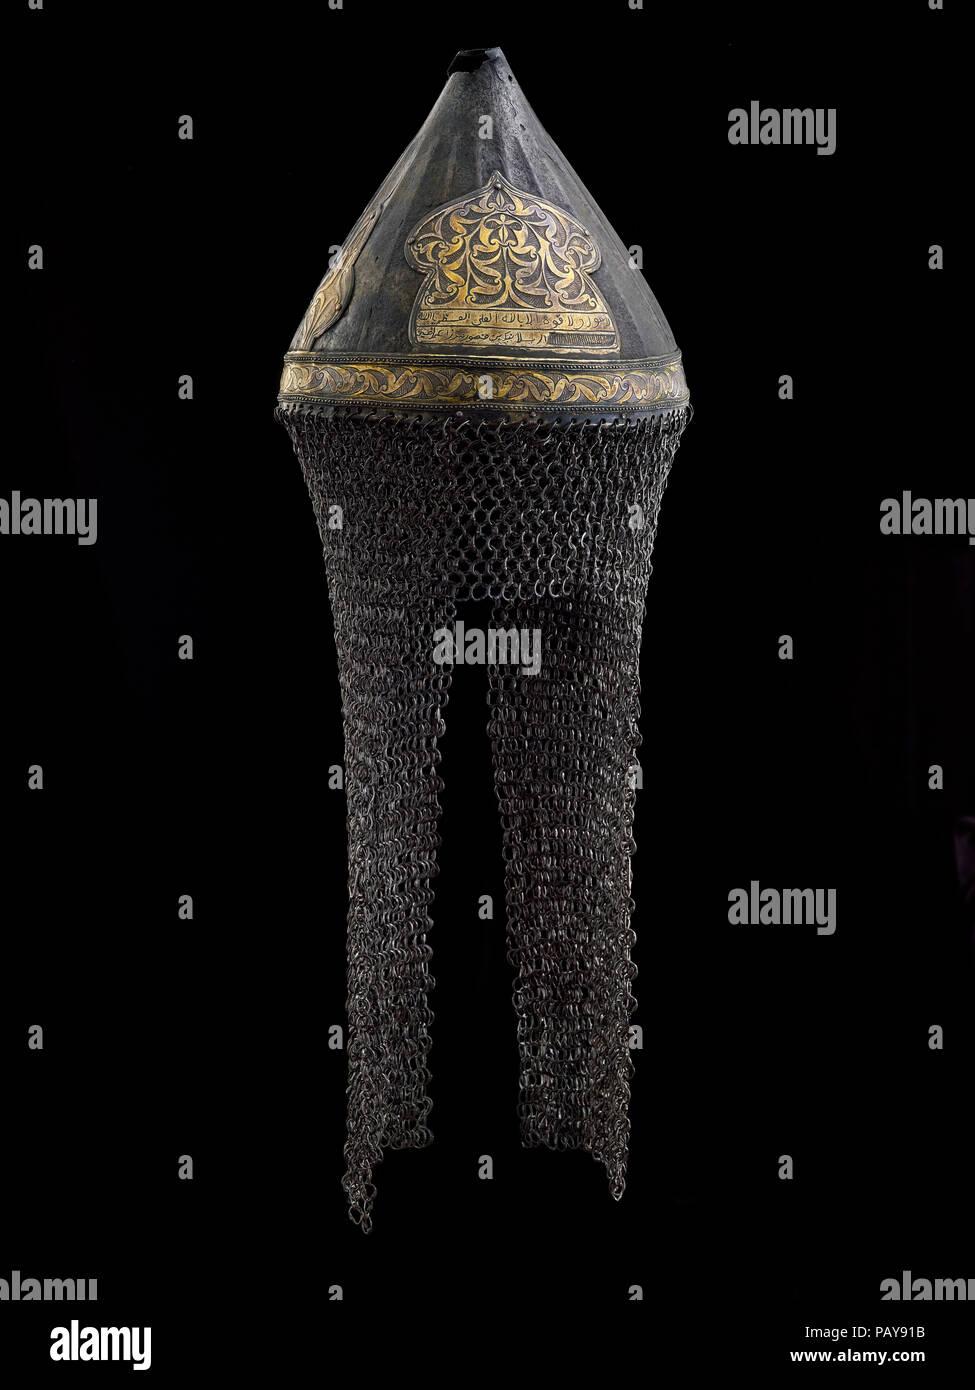 Tartar helmet - Stock Image